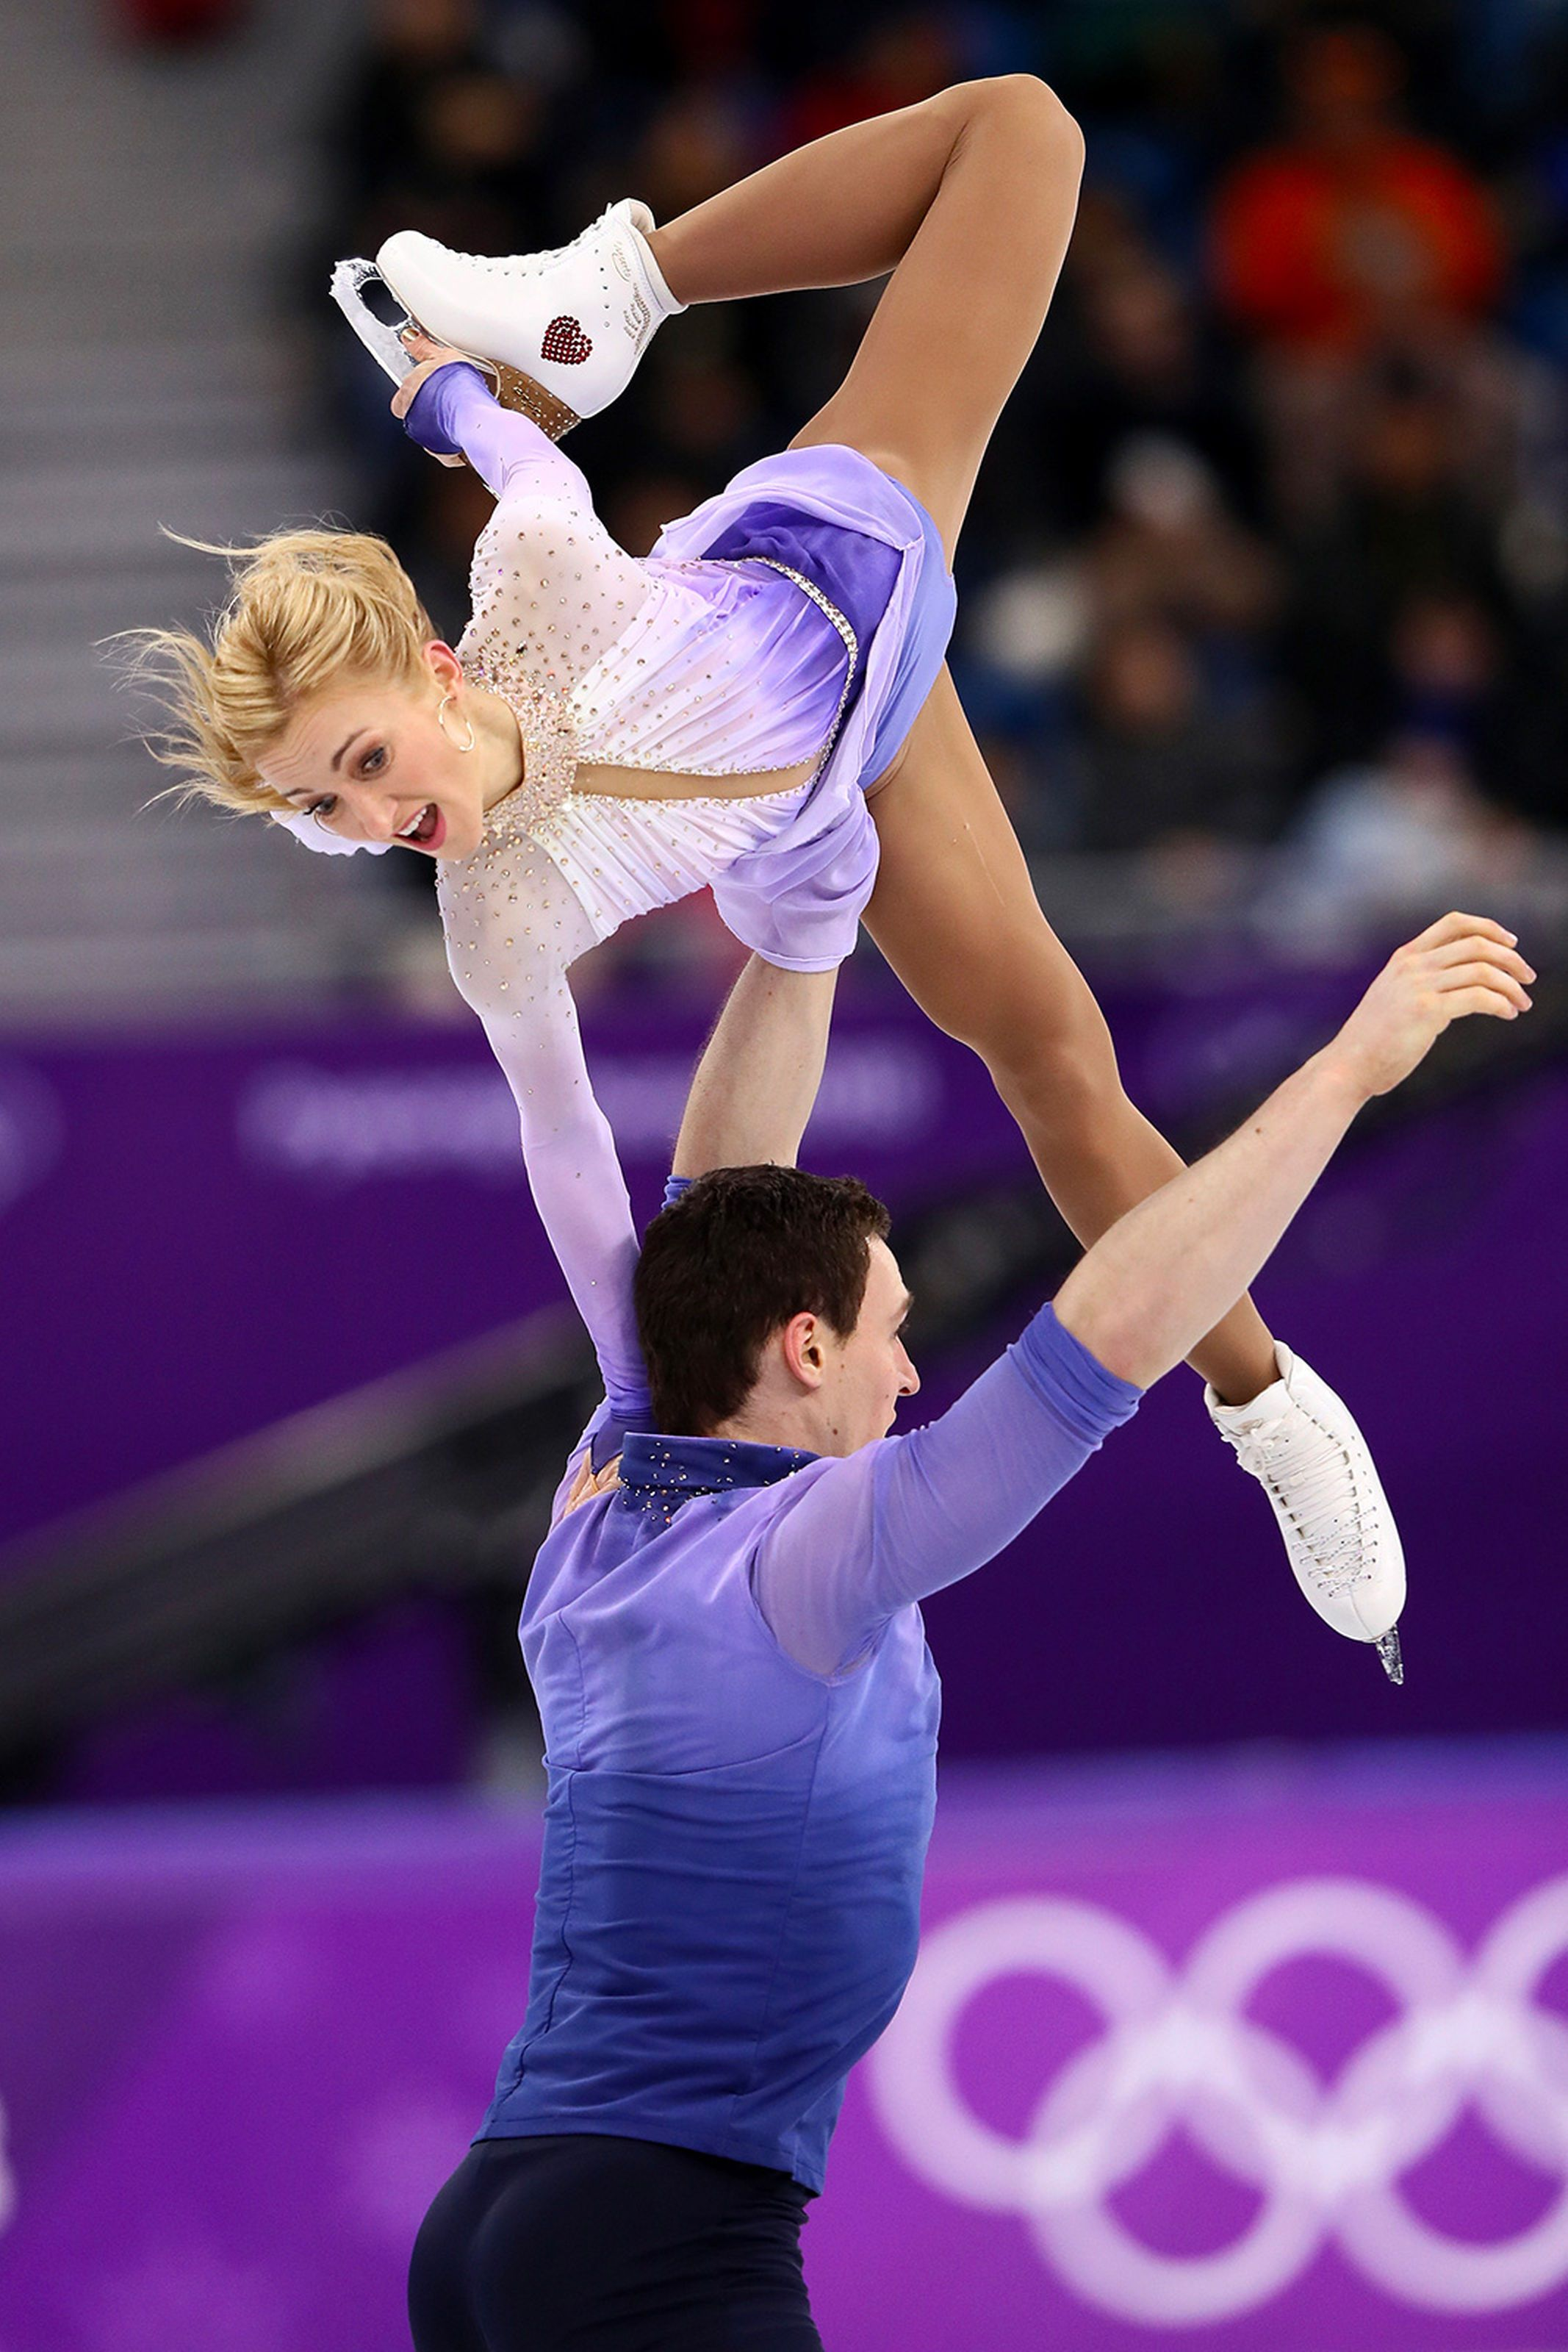 Germany's Aljona Savchenko and Bruno Massot wowed the